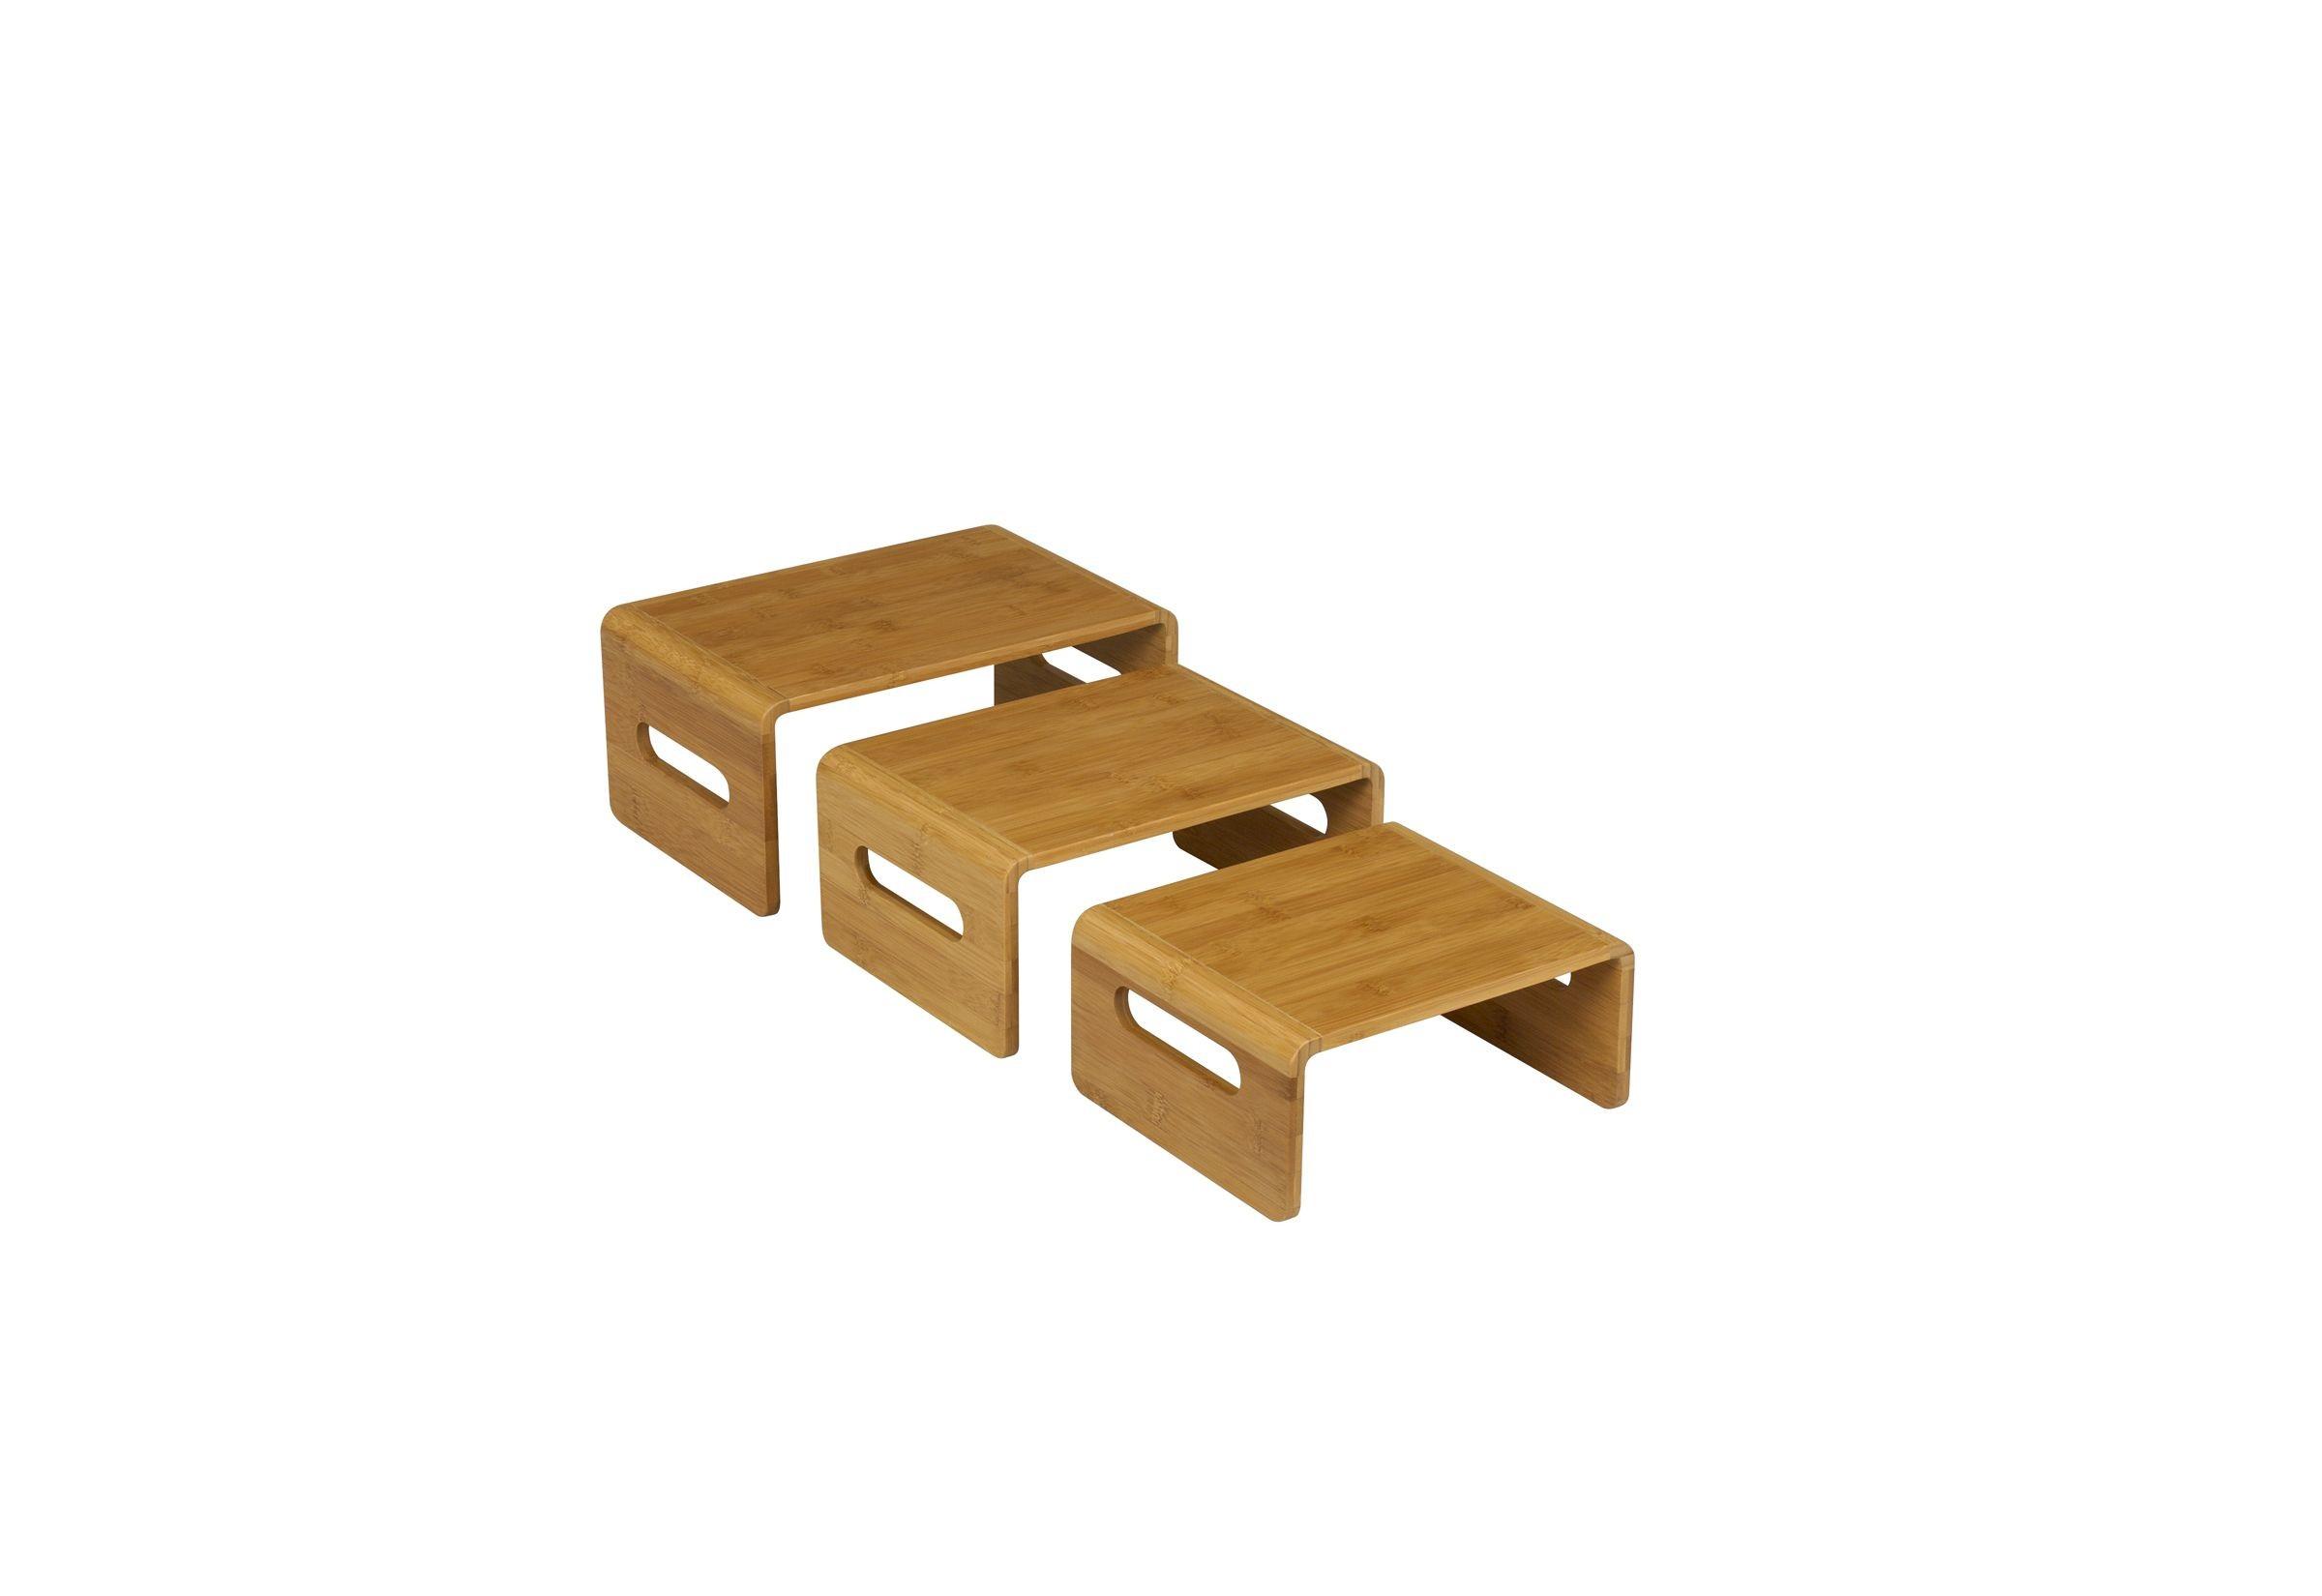 "Rosseto SB101 Natural Finish Bamboo Rectangular Risers Set of 3, 11"" x 8"" x 5.5""H"